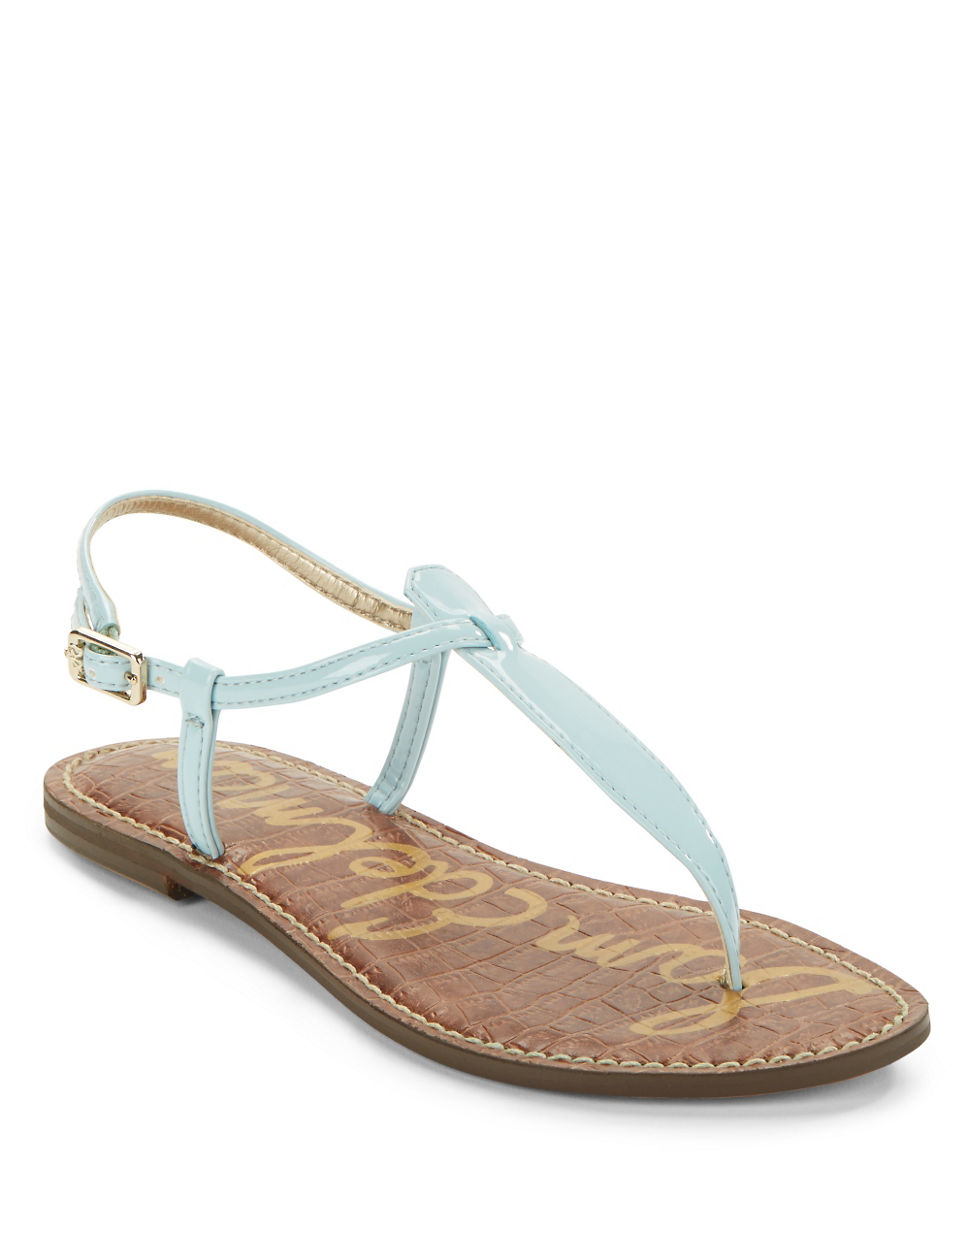 f780703d845441 Sam Edelman Gigi Patent Leather Thong Sandals in Blue - Lyst